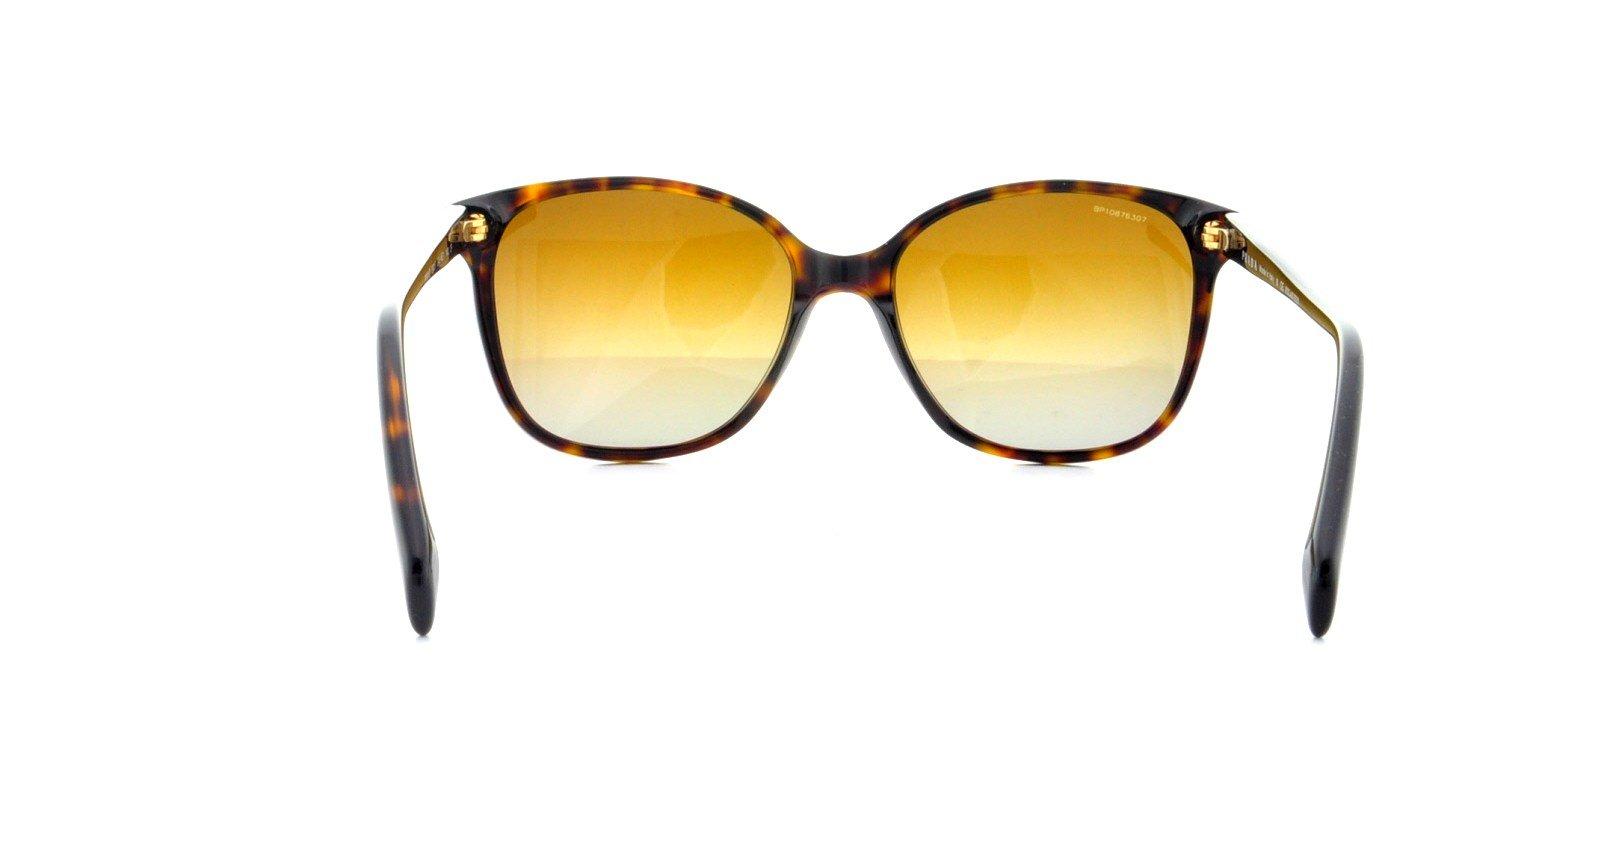 Prada Sunglasses - PR01OS / Frame: Havana Lens: Polar Brown Gradient by Prada